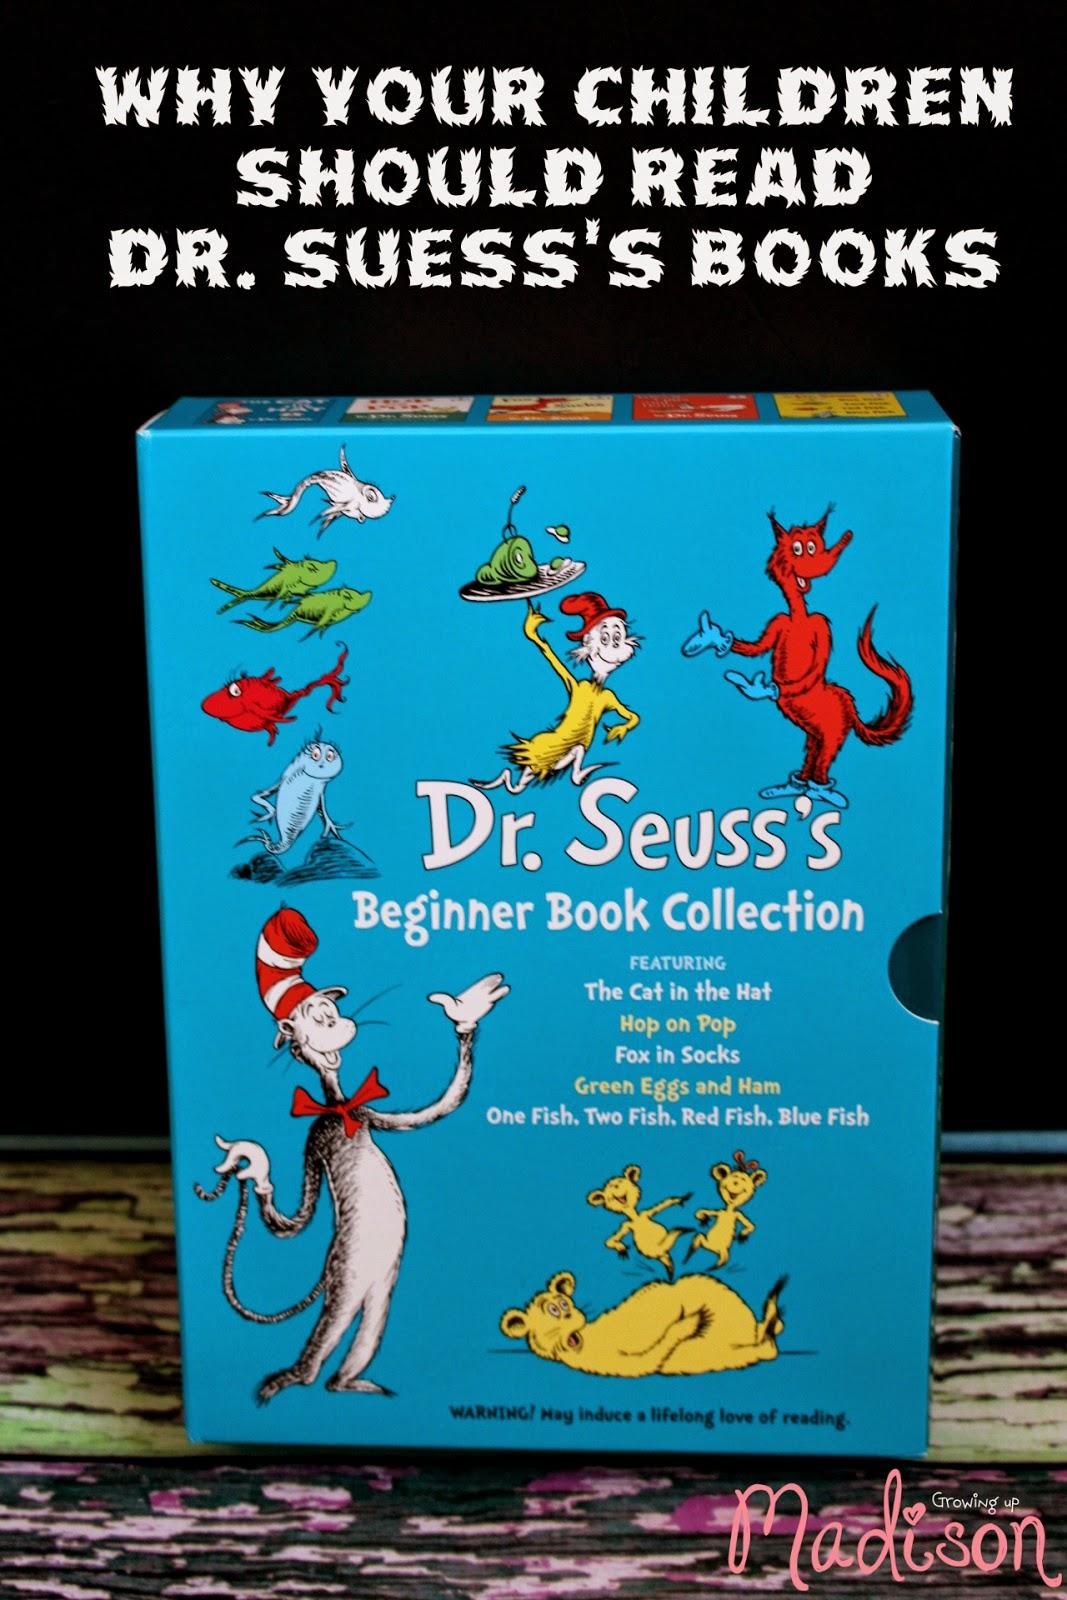 AnnMarie John: Why Your Children Should Read Dr. Seuss Books